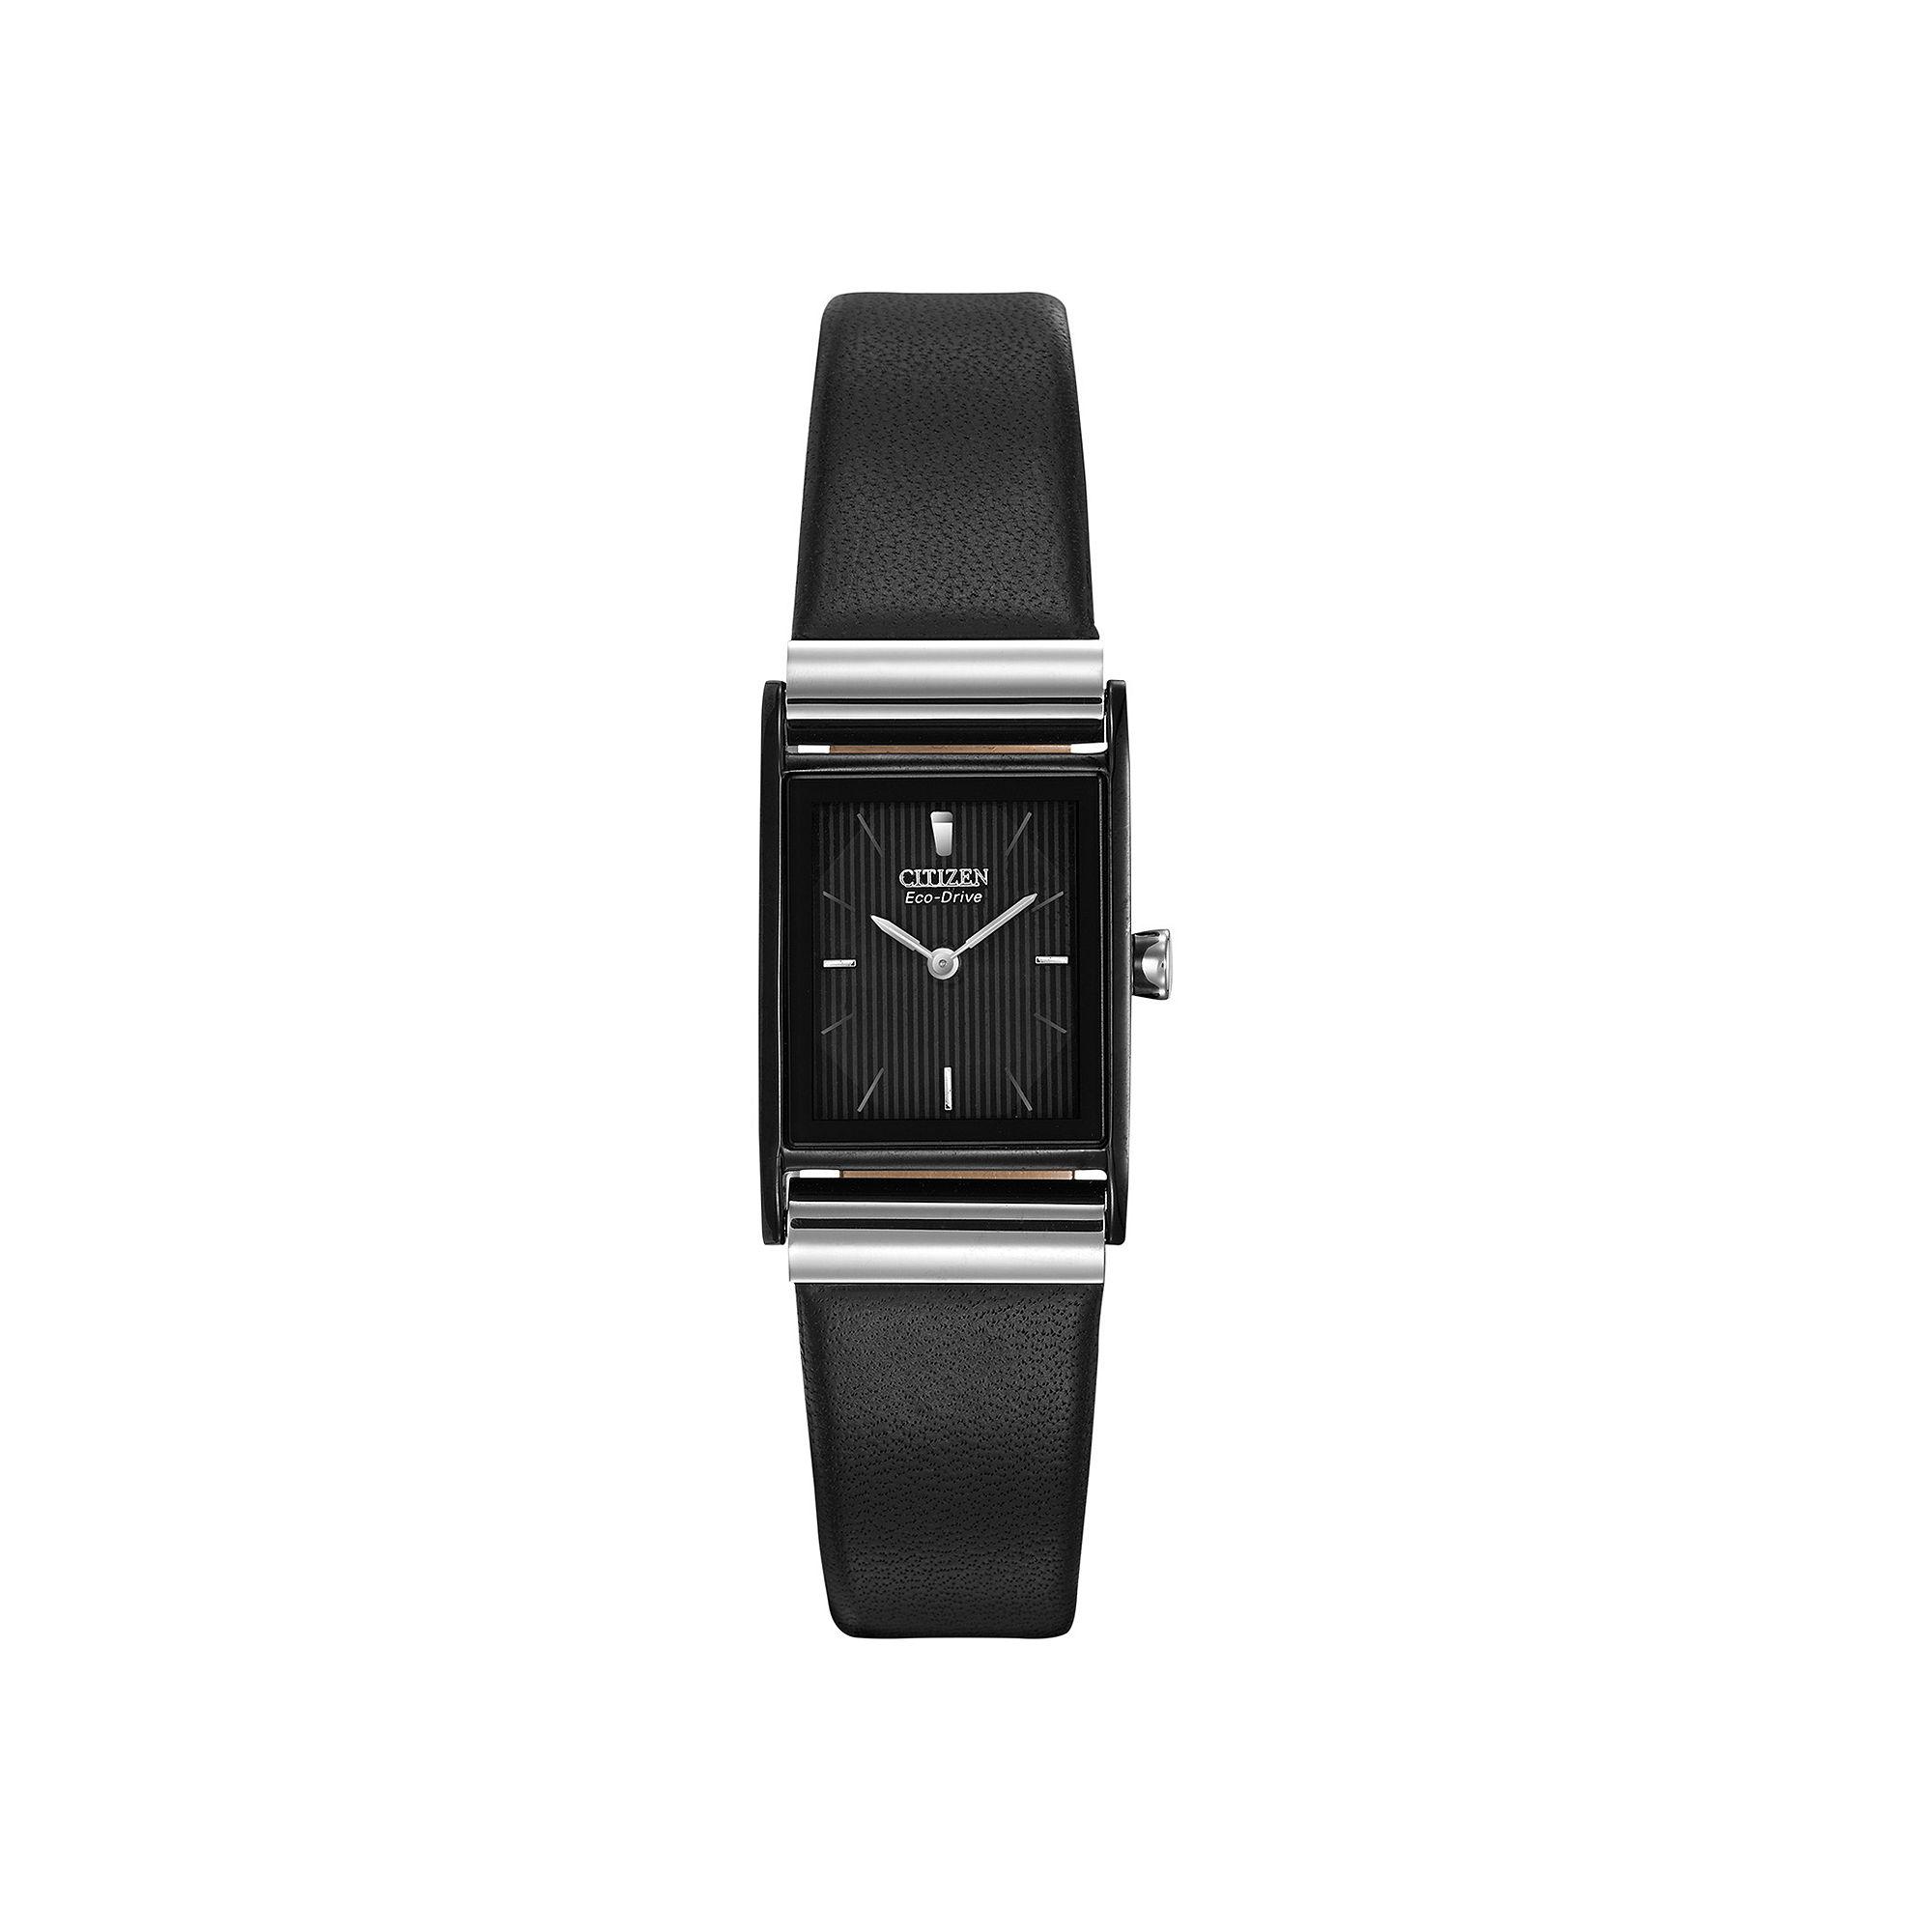 Citizen Eco-Drive Womens Rectangular Black Leather Strap Watch EW9215-01E